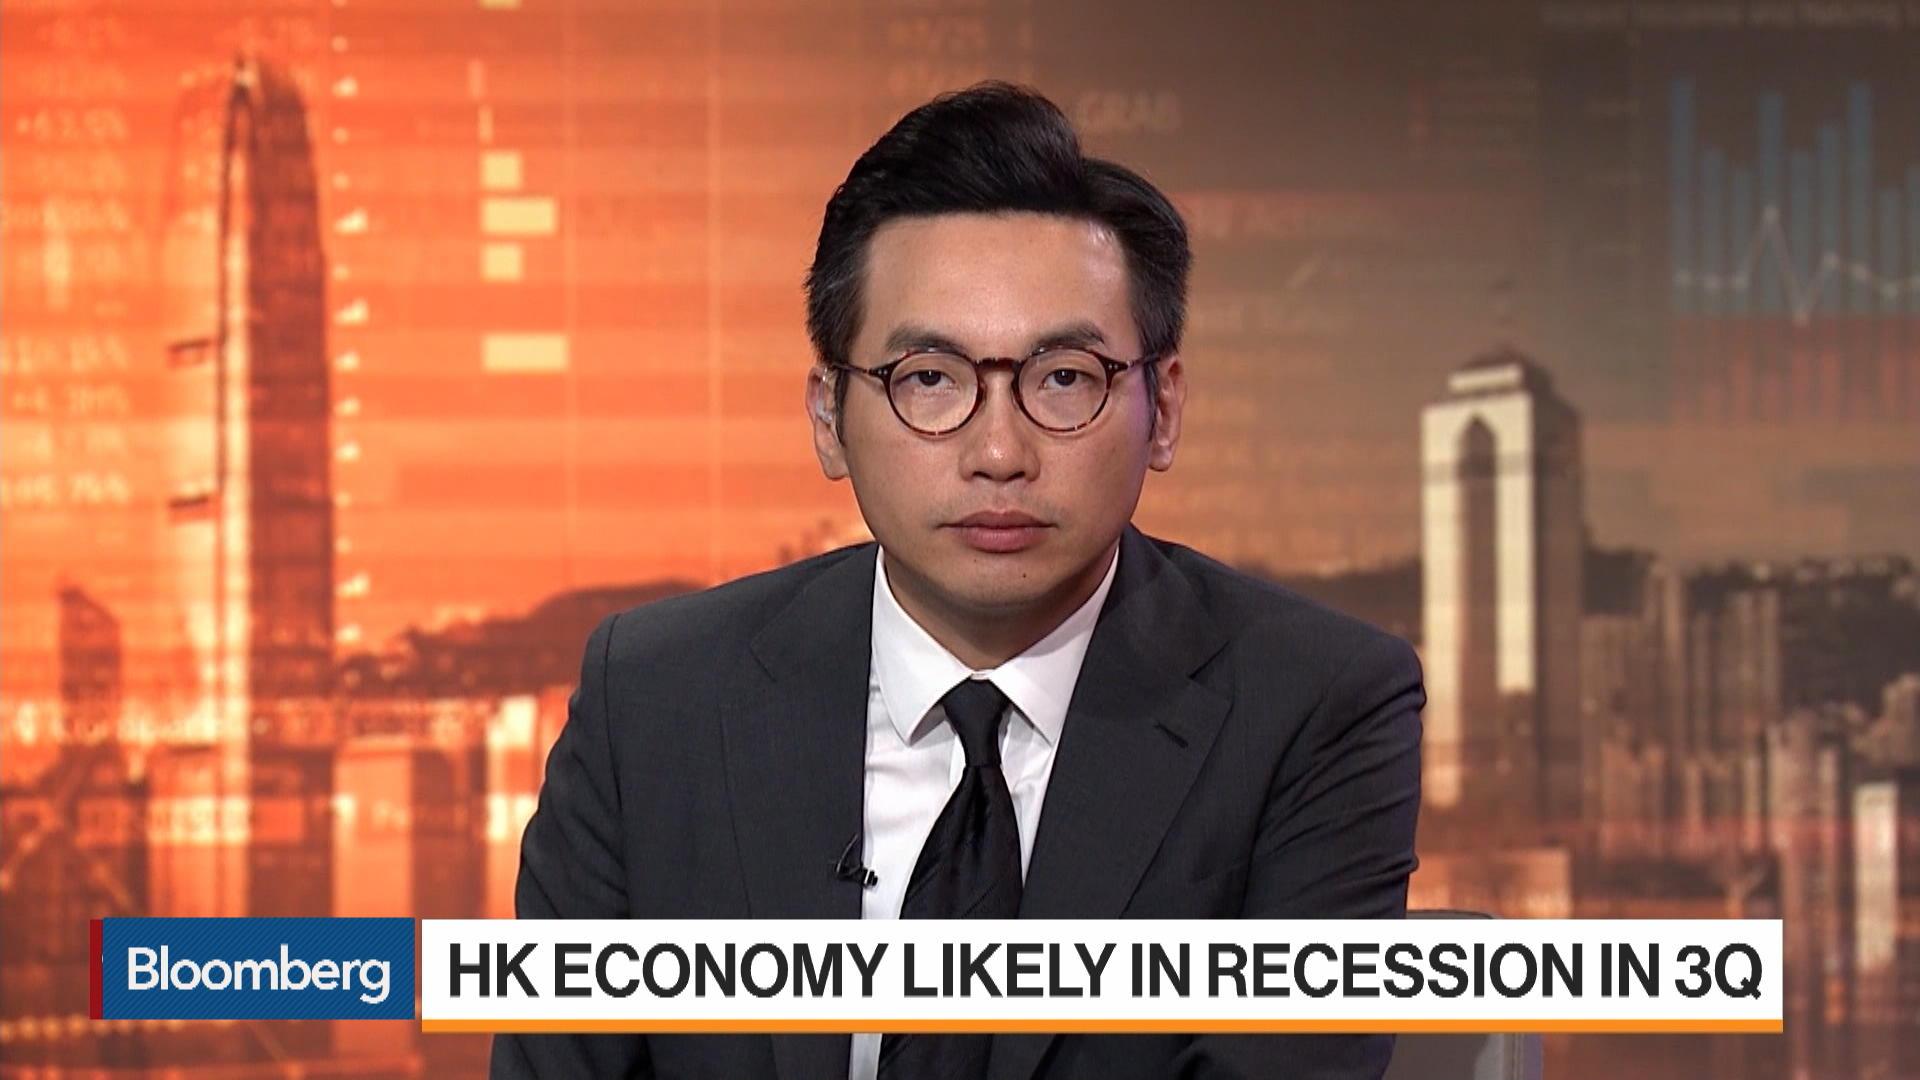 Hong Kong Legislative Council Member Alvin Yeung on Carrie Lam's Policy Speech, HK Unrest